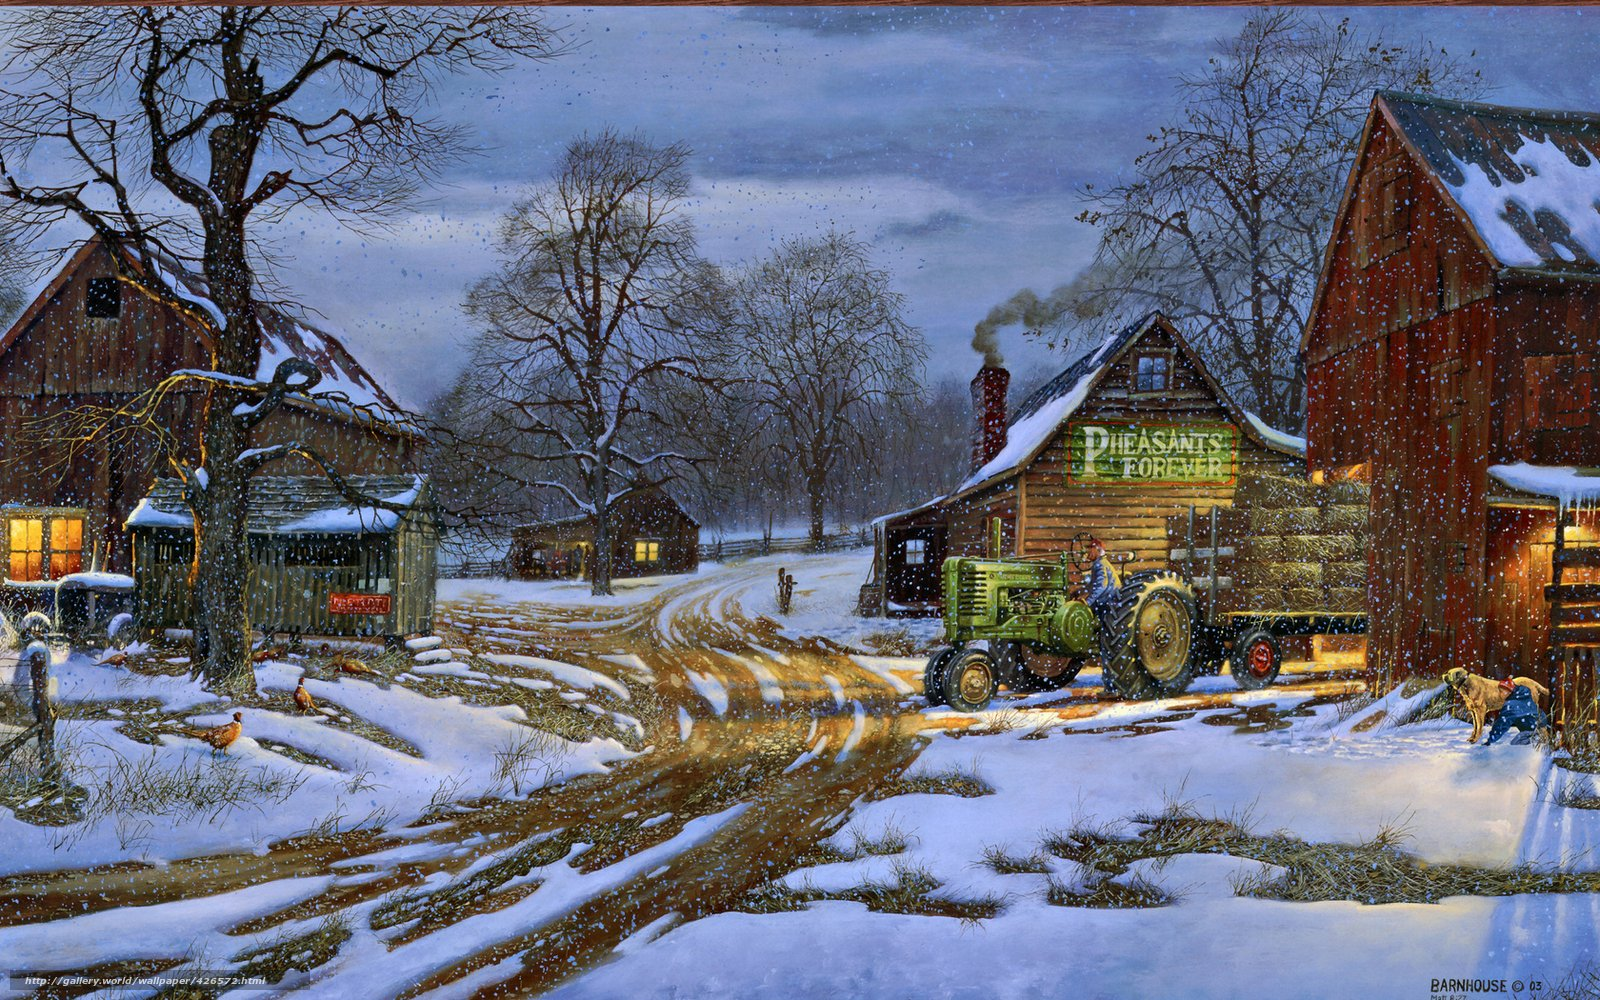 Download wallpaper Winter snow tractor farm desktop wallpaper 1600x1000